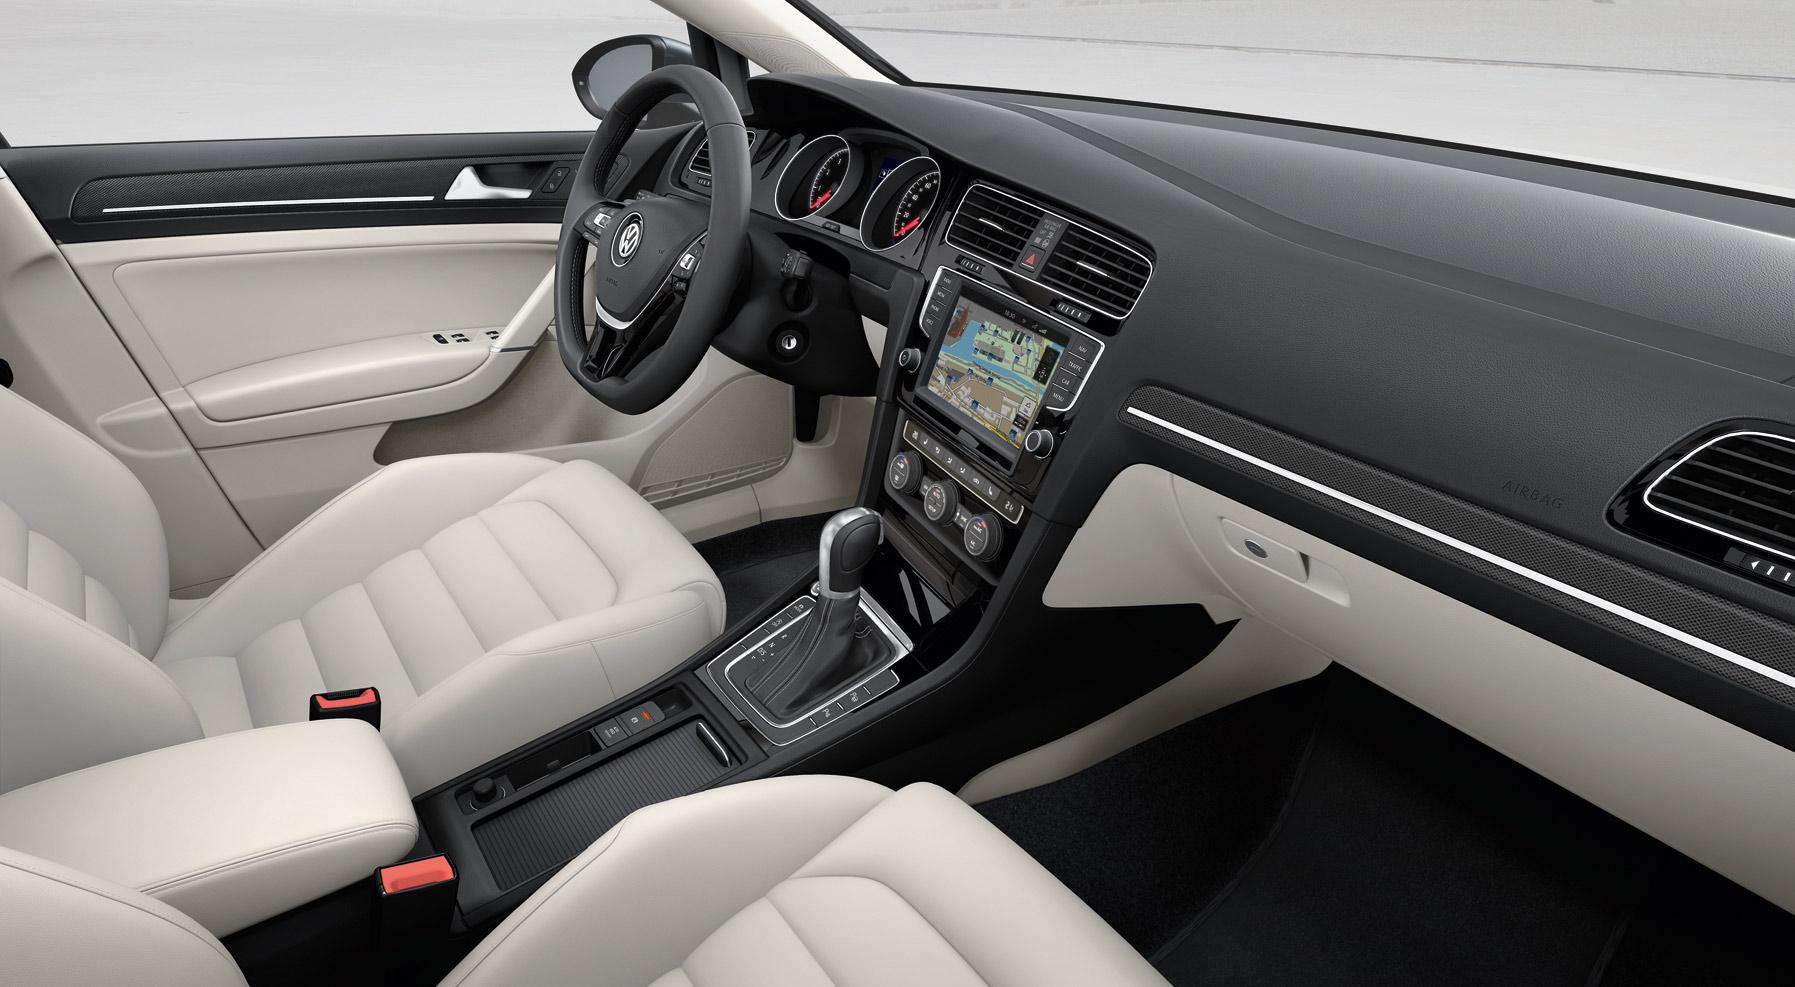 Volkswagen Golf 7 Interior 7